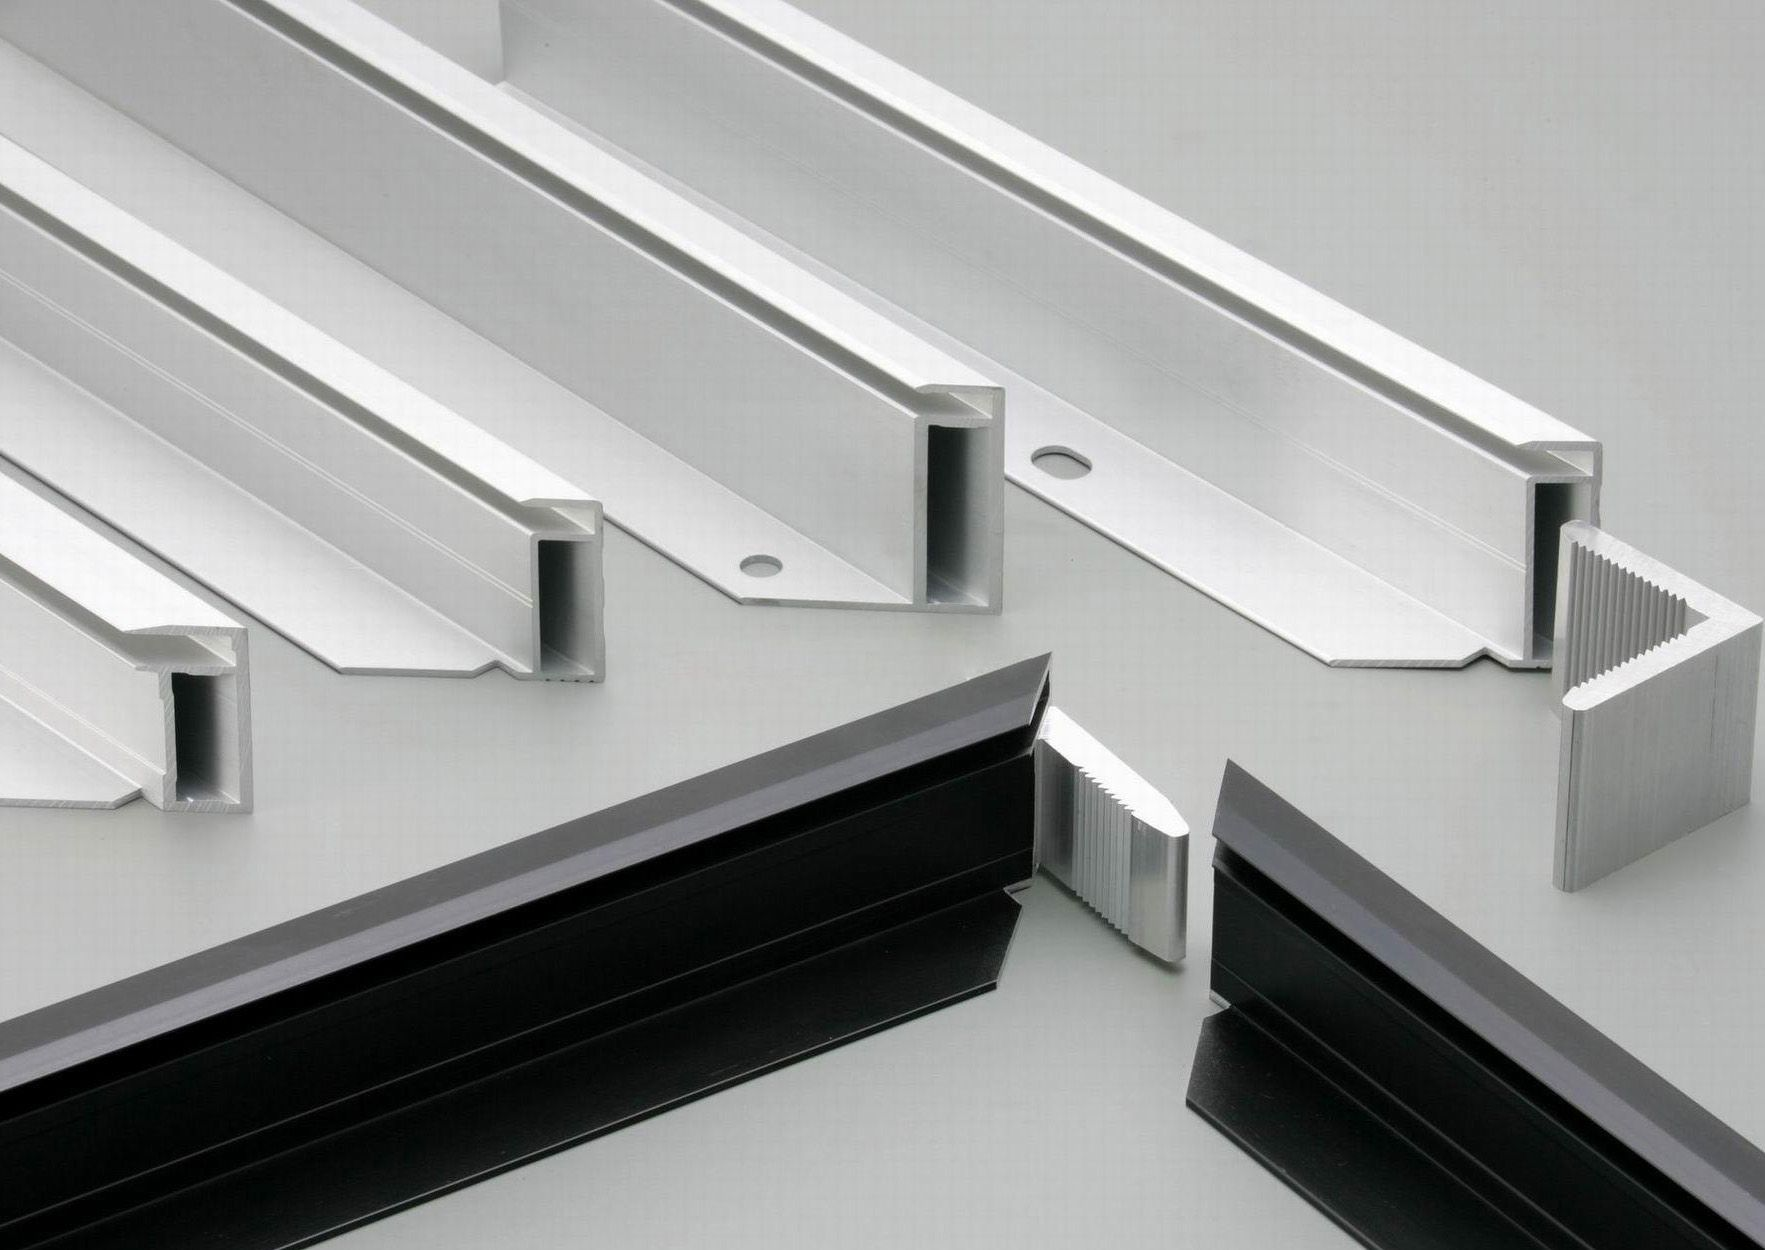 Aluminium profile product aluminium alloy frame for